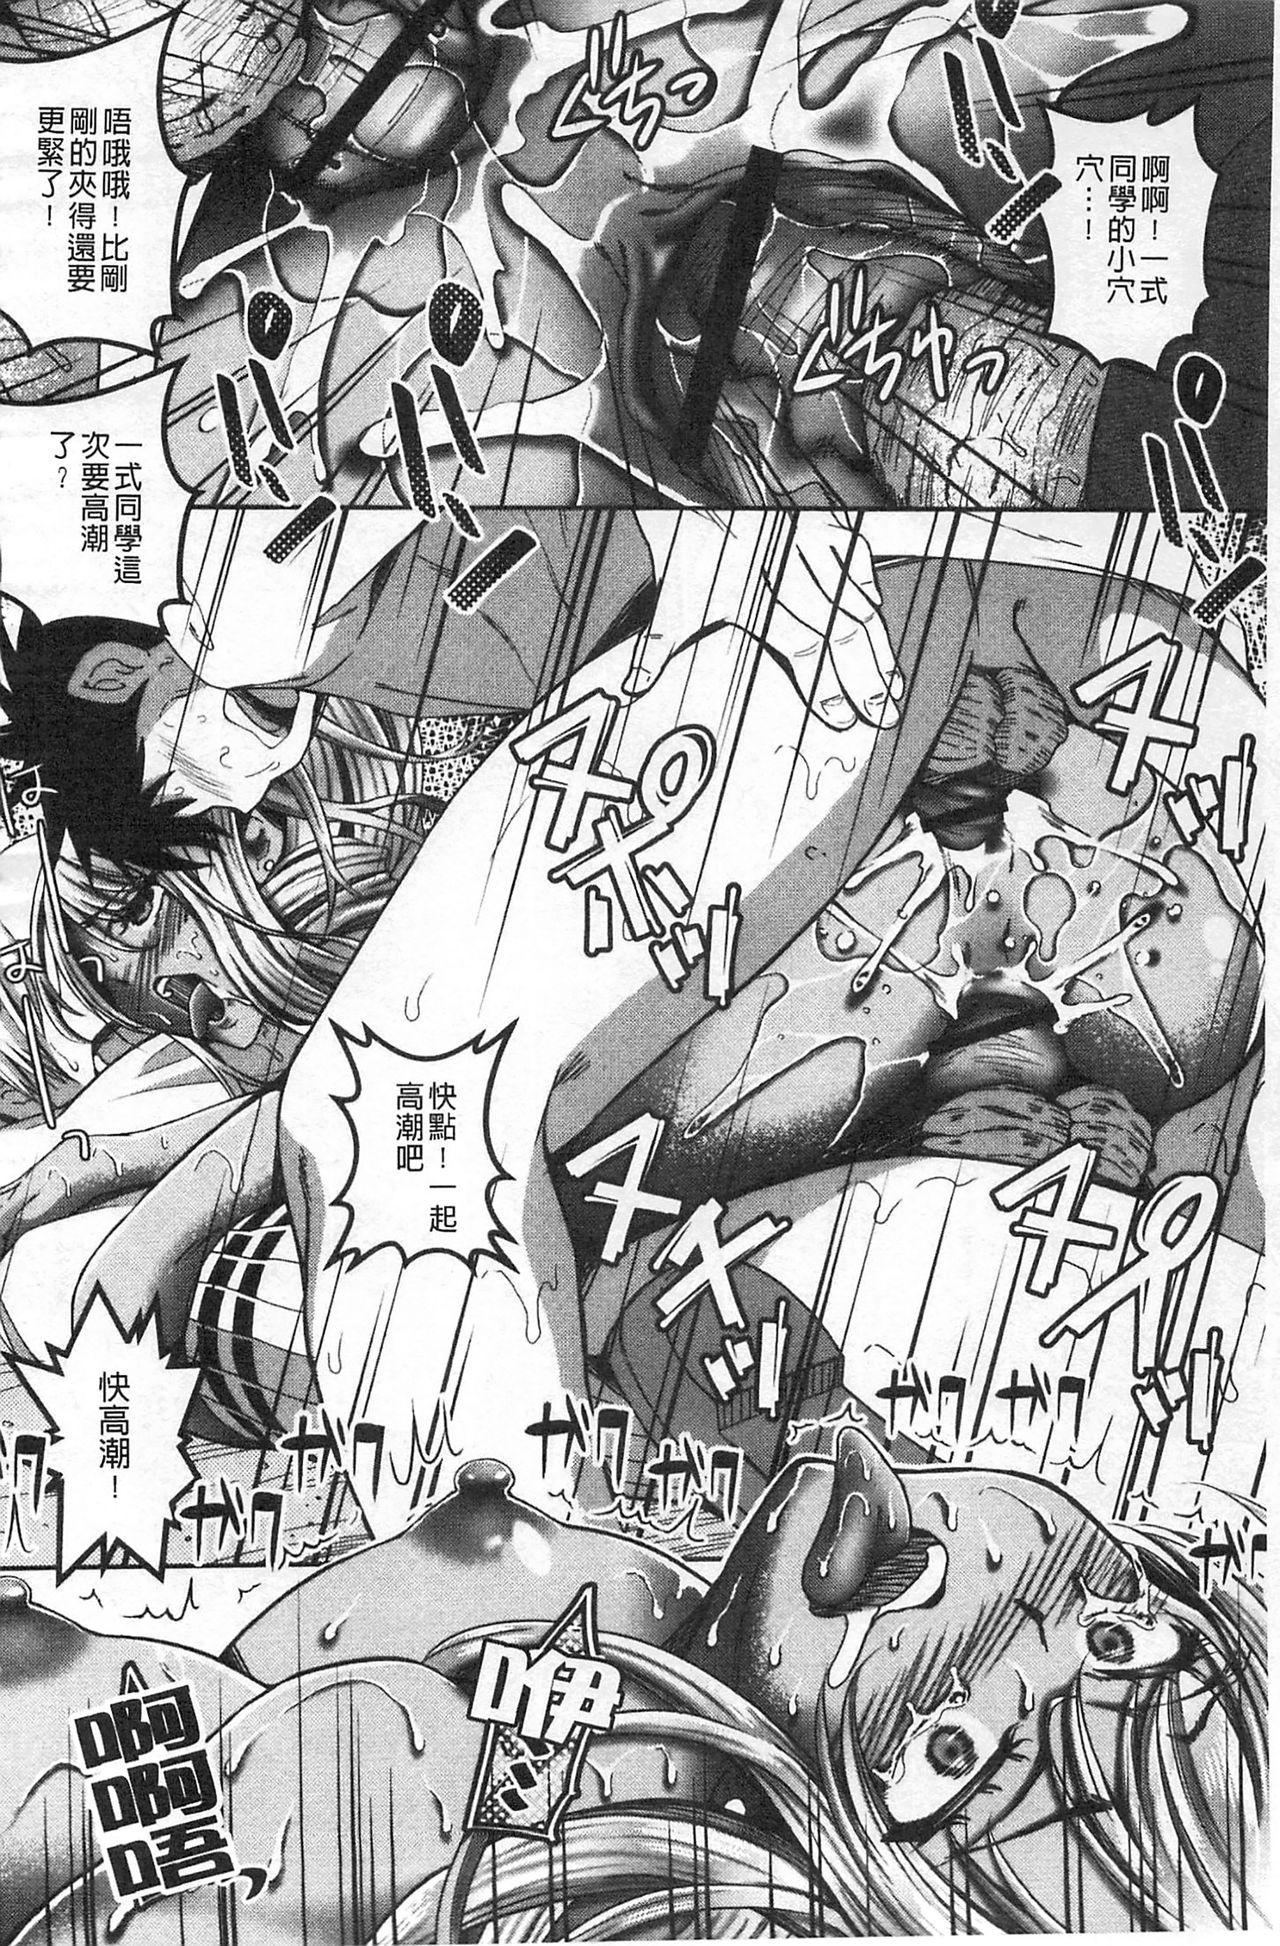 Kanjuku Otome no Odoshikata | 姦熟乙女的脅迫法 93